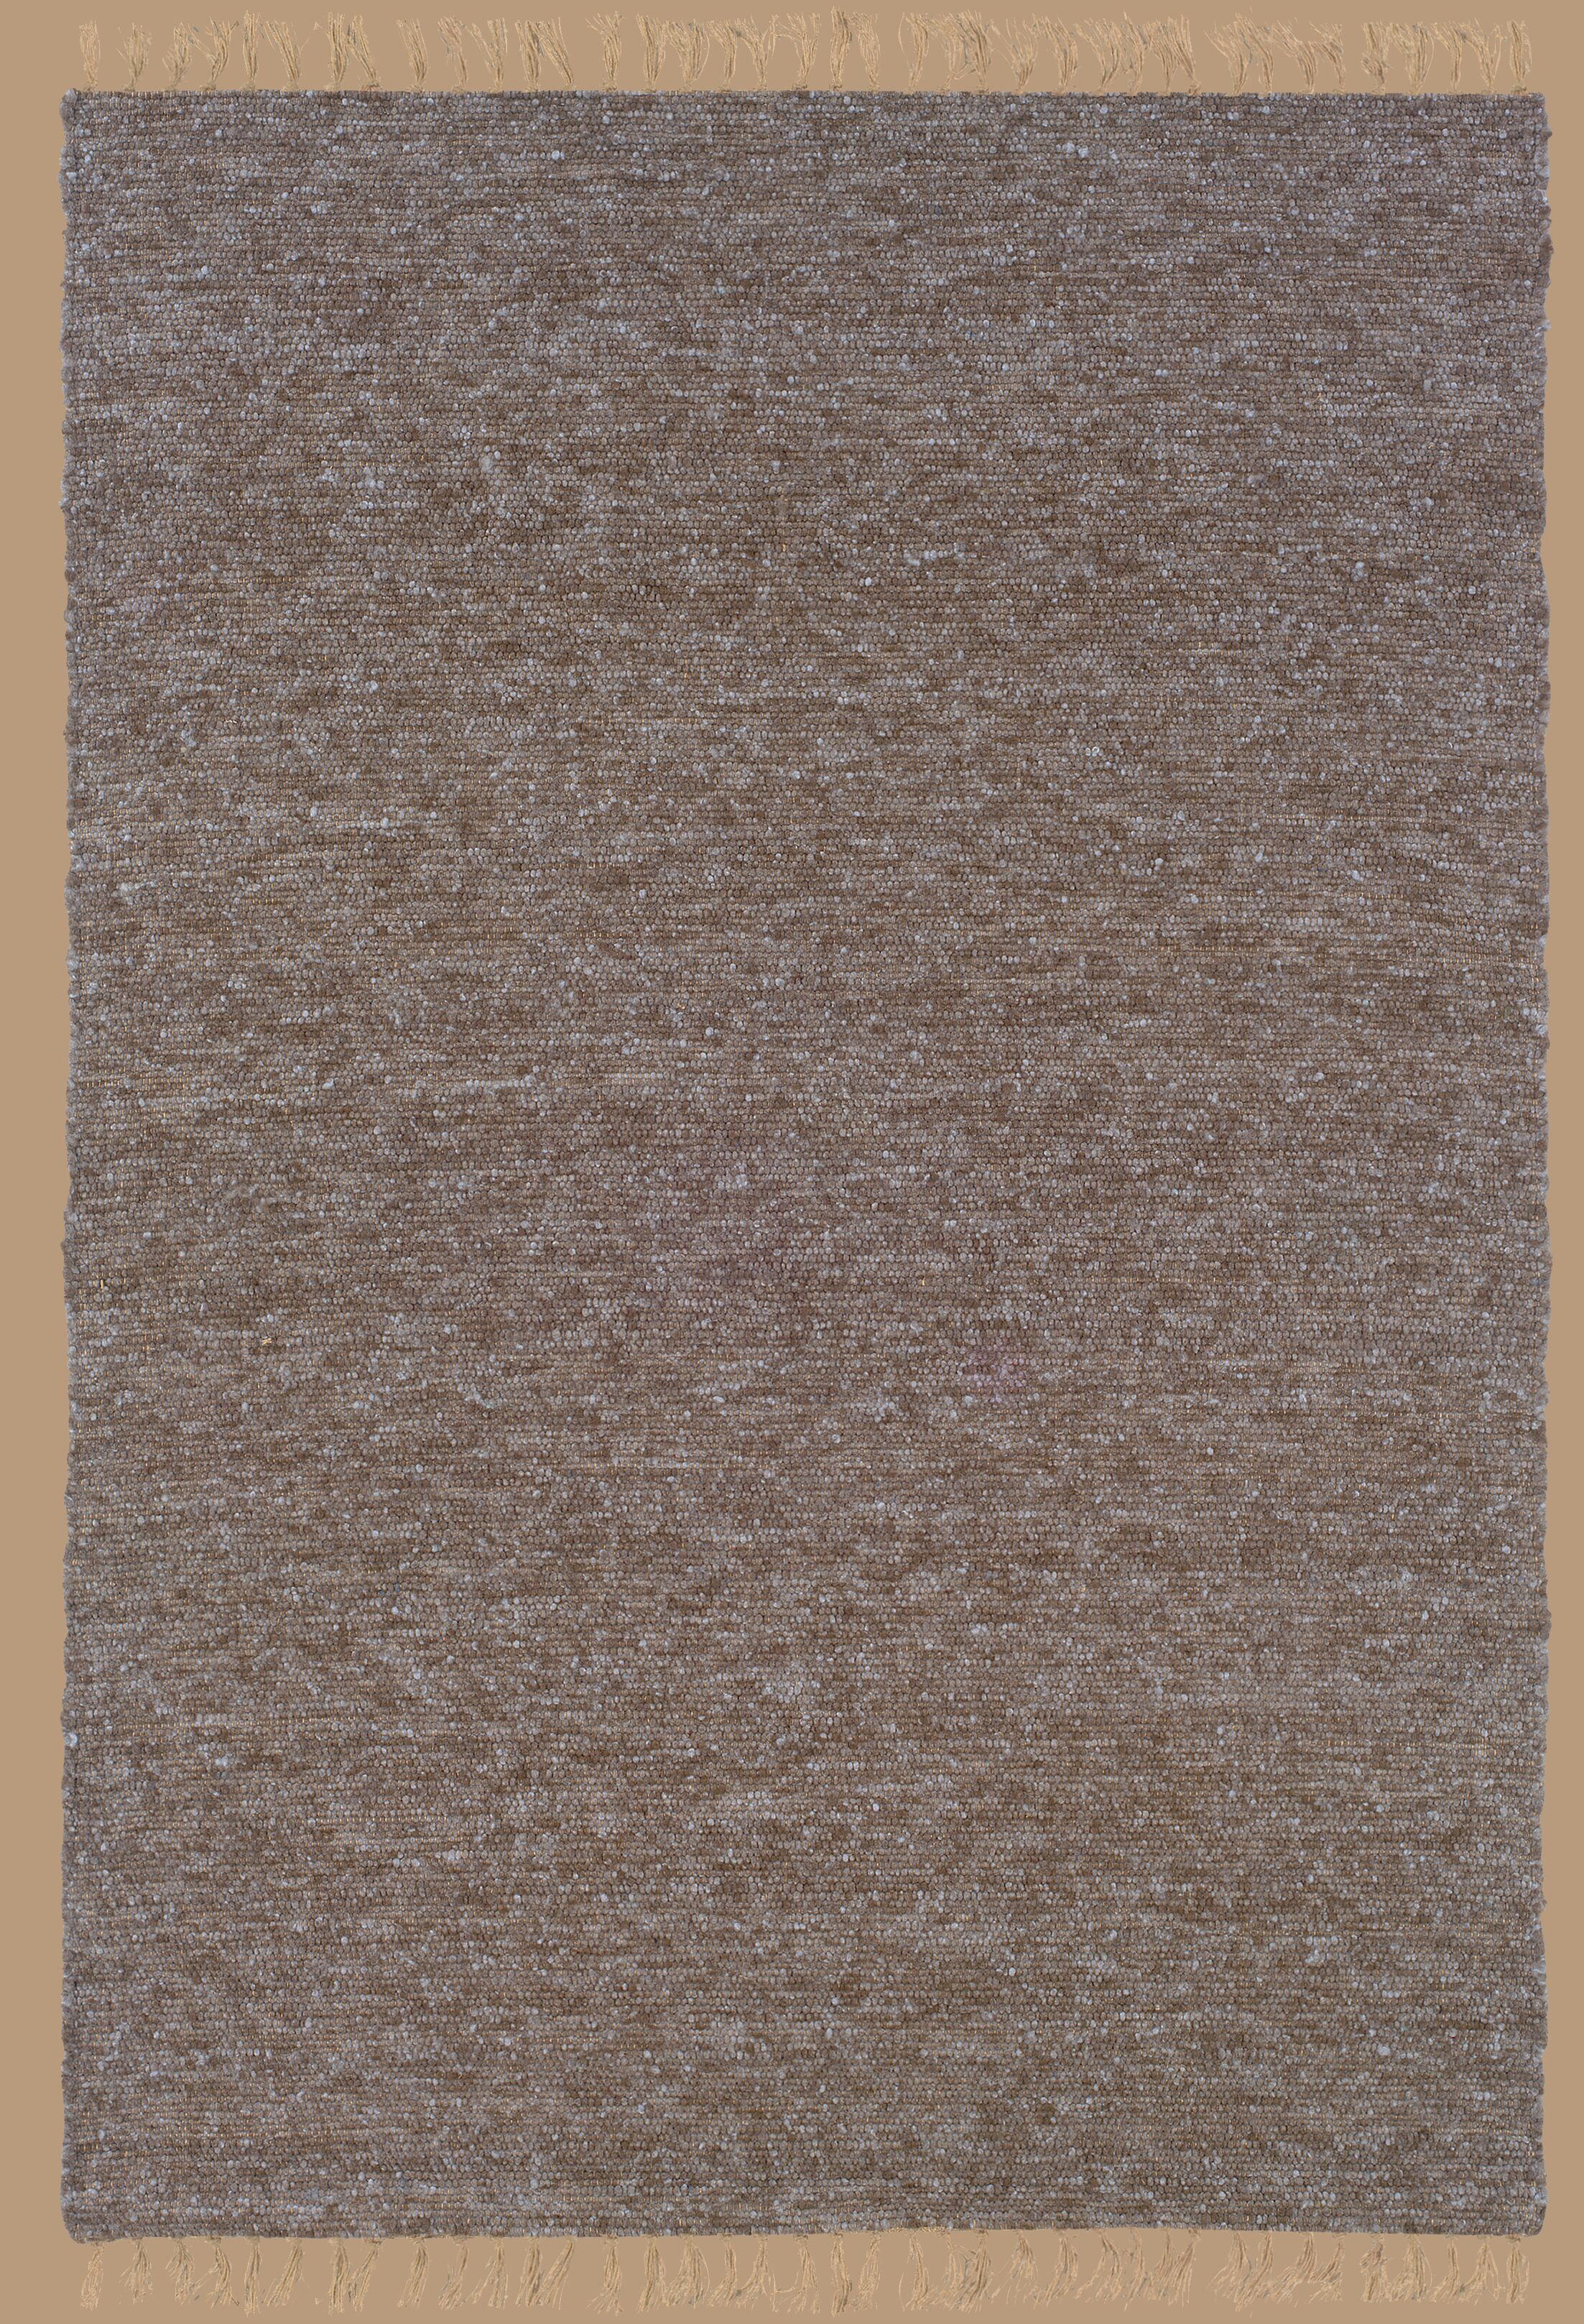 Landenberg Hand-Woven Brown/Blue Area Rug Rug Size: Rectangle 3'6